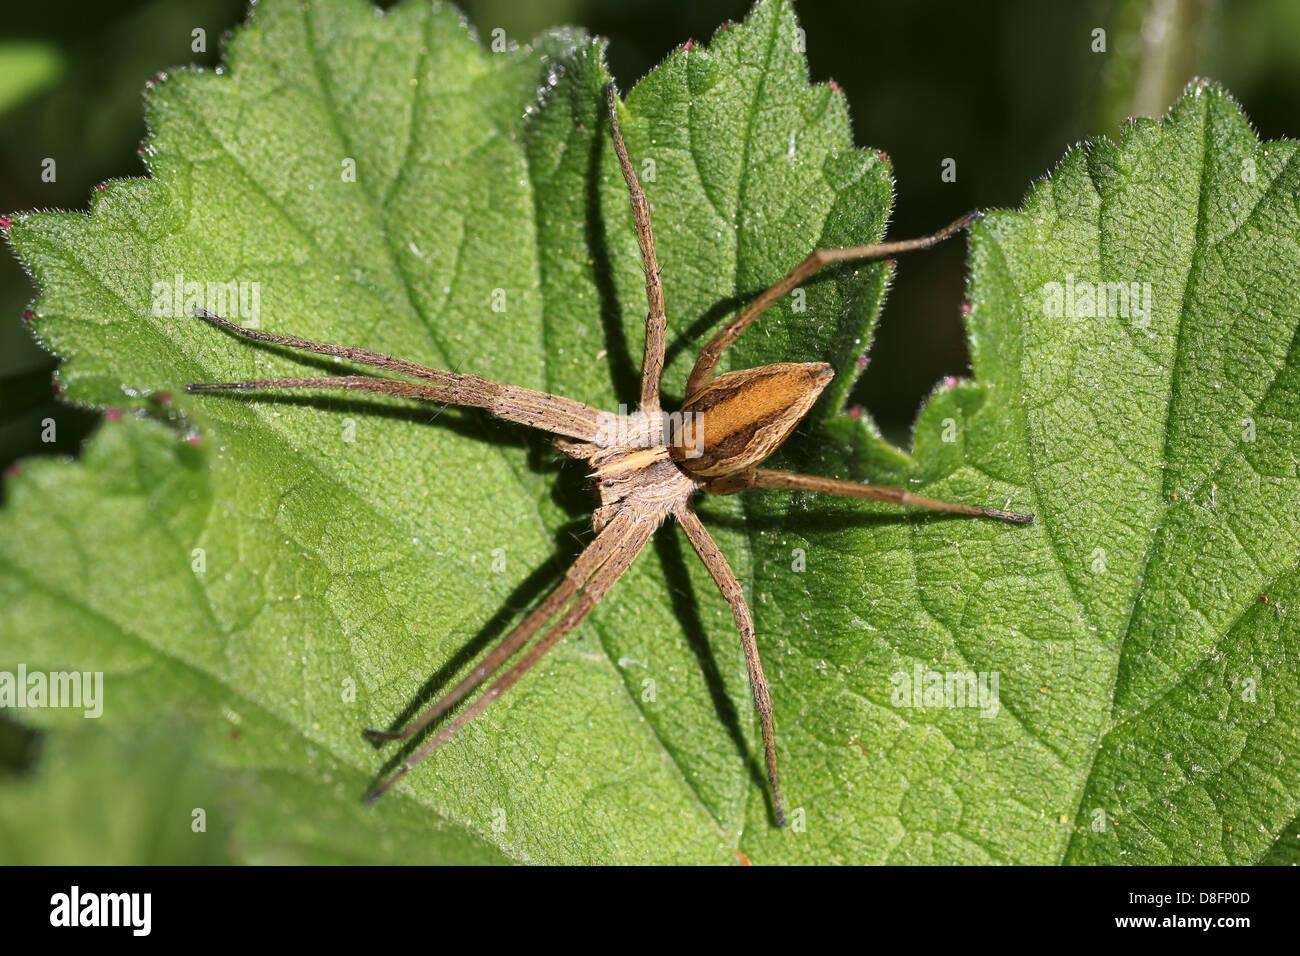 Nursery-web Spider Pisaura mirabilis - Stock Image